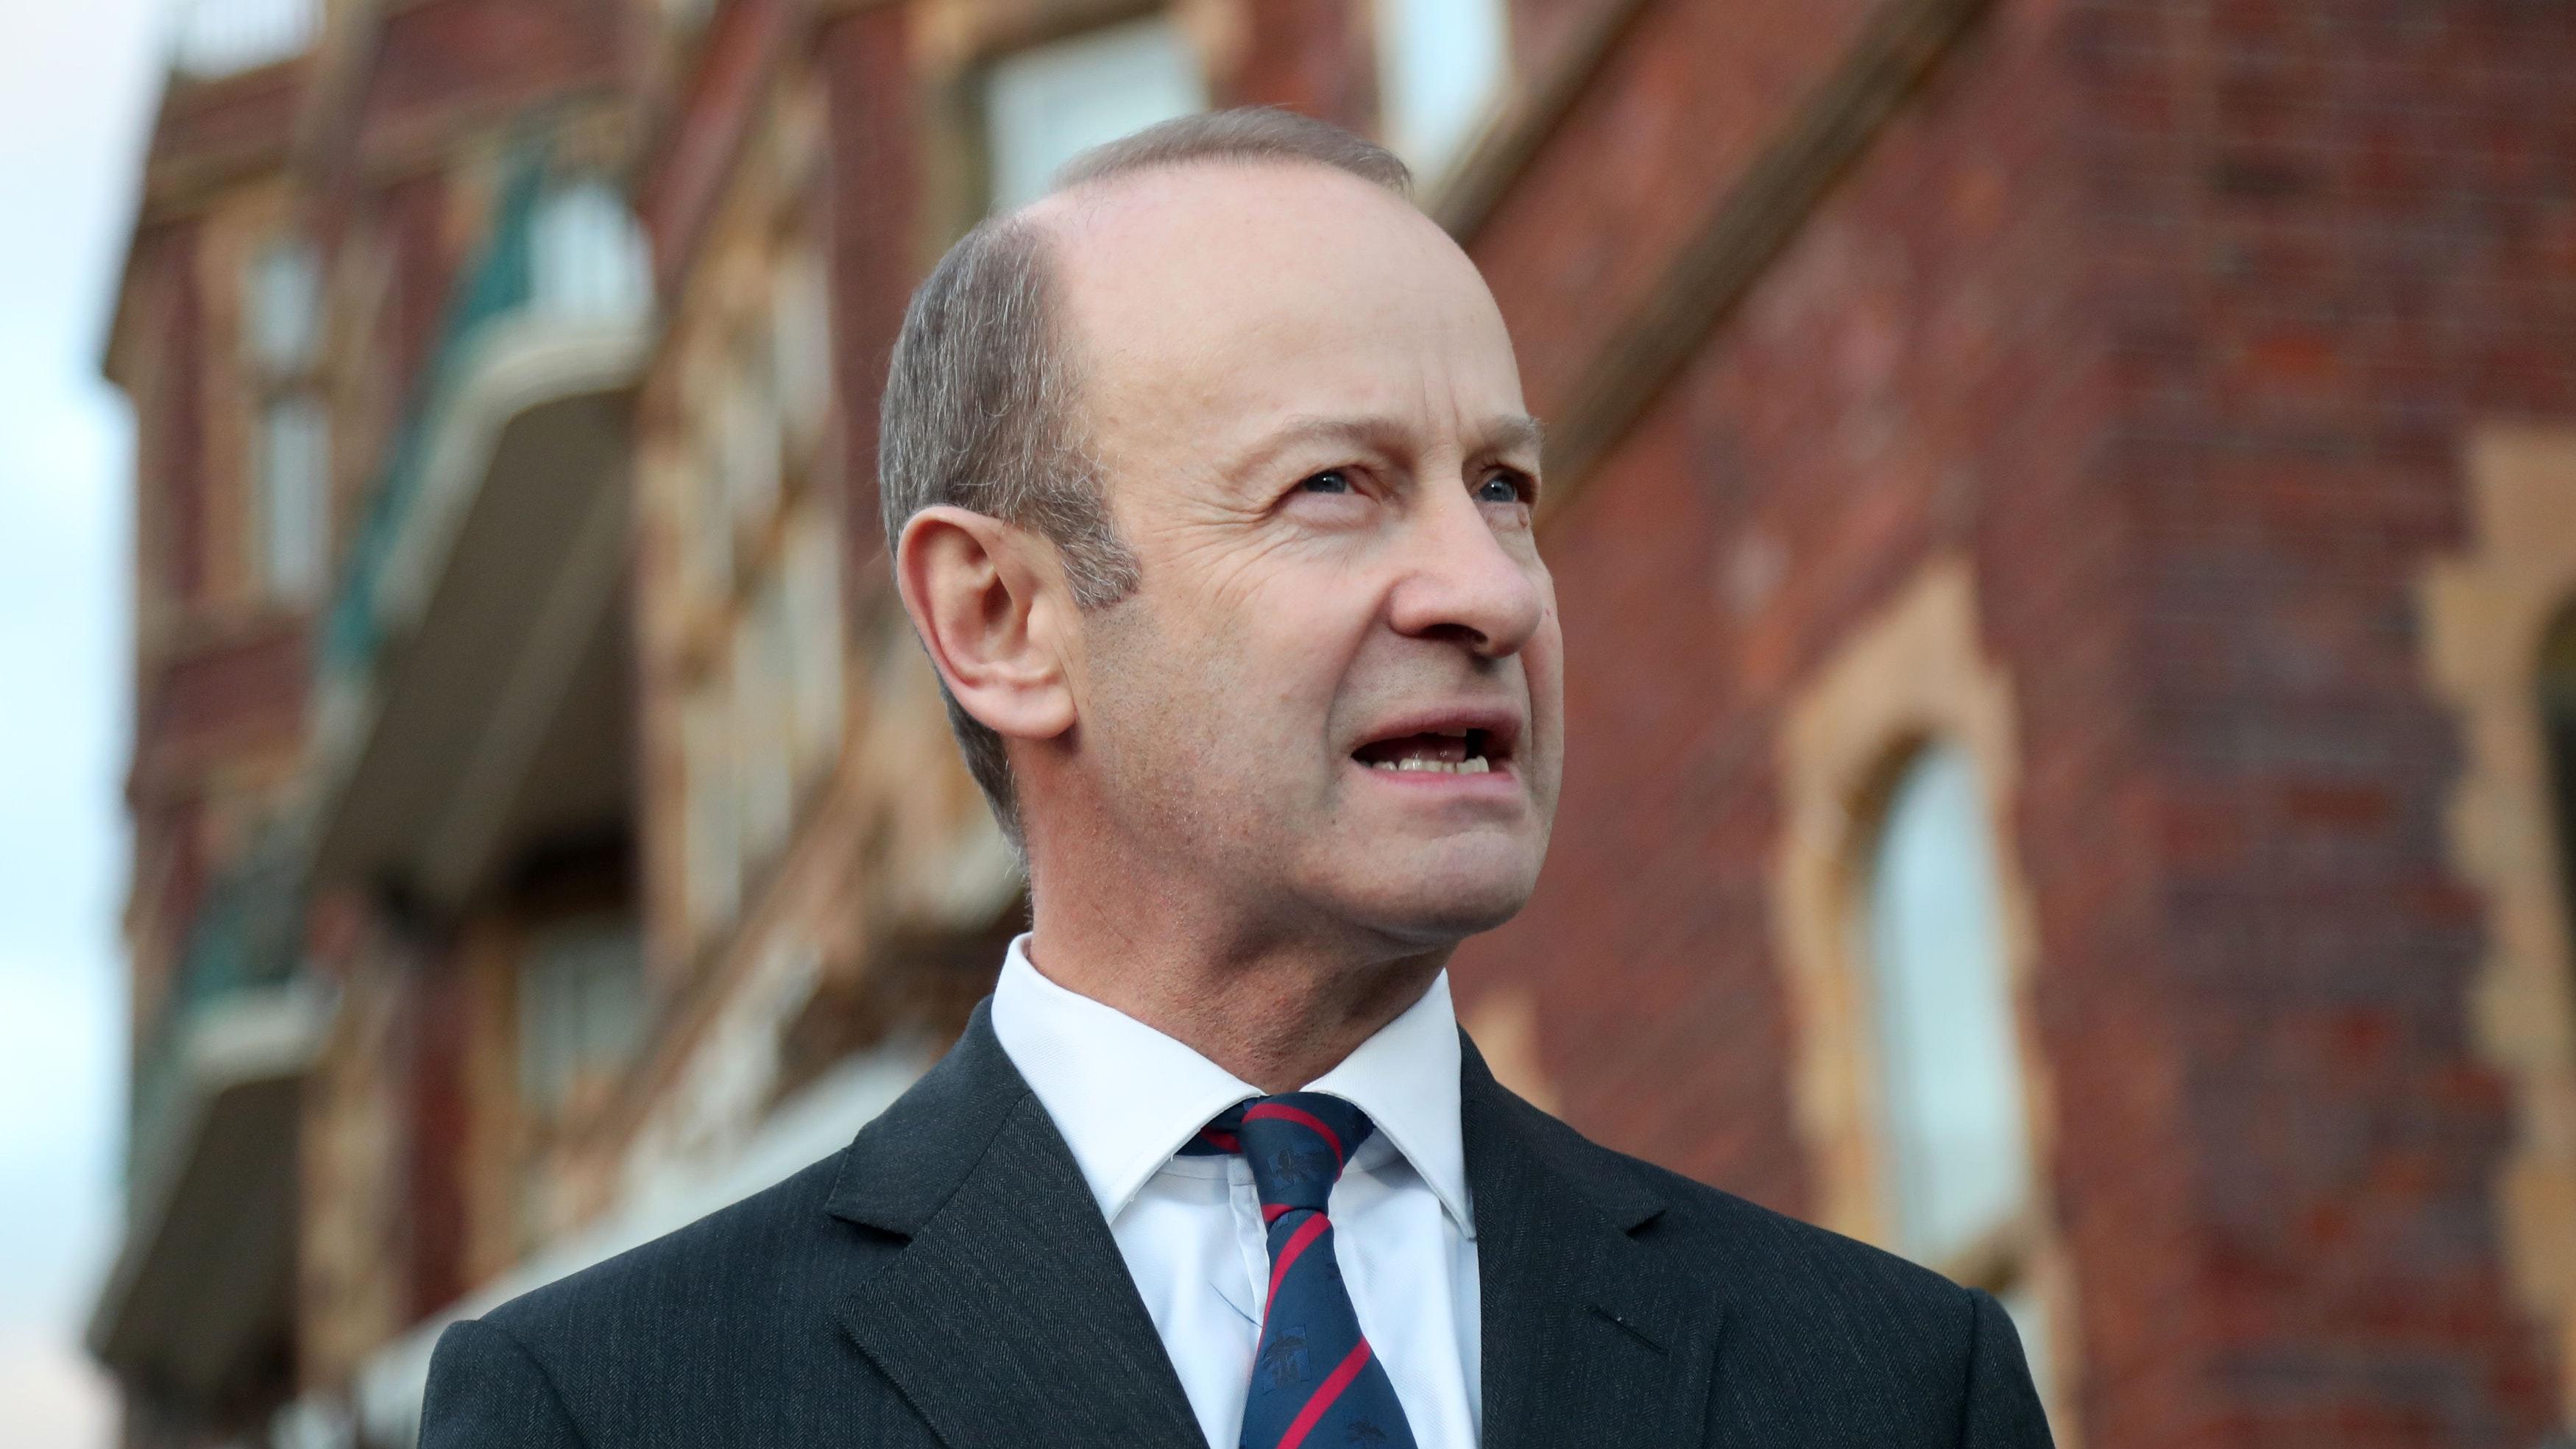 Folkestone-based Ukip leader Henry Bolton loses vote of no confidence